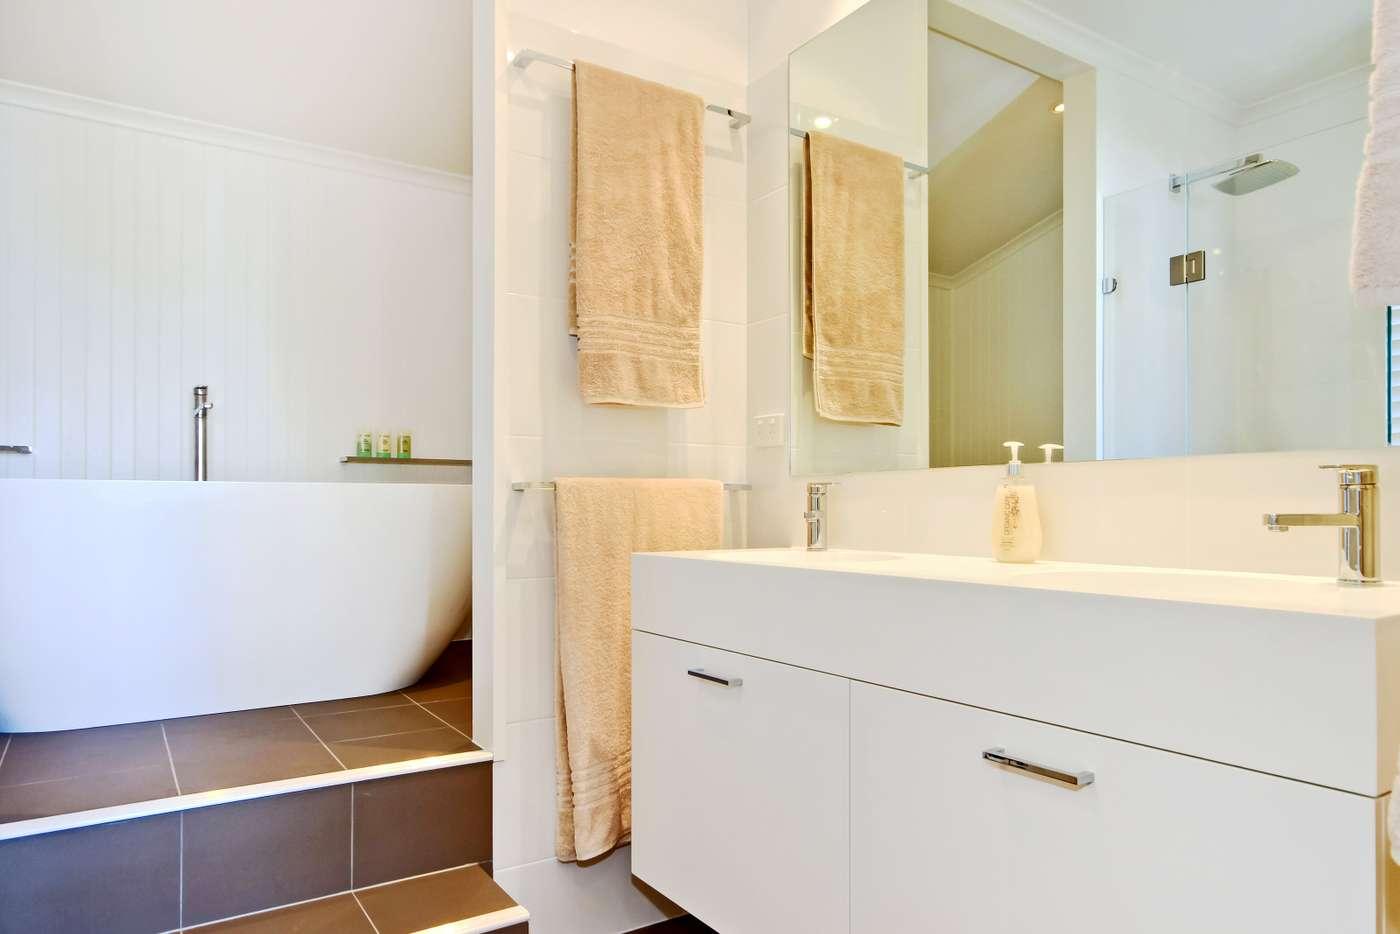 Fifth view of Homely house listing, 7 - 9 Dunstan Street, Aldinga Beach SA 5173